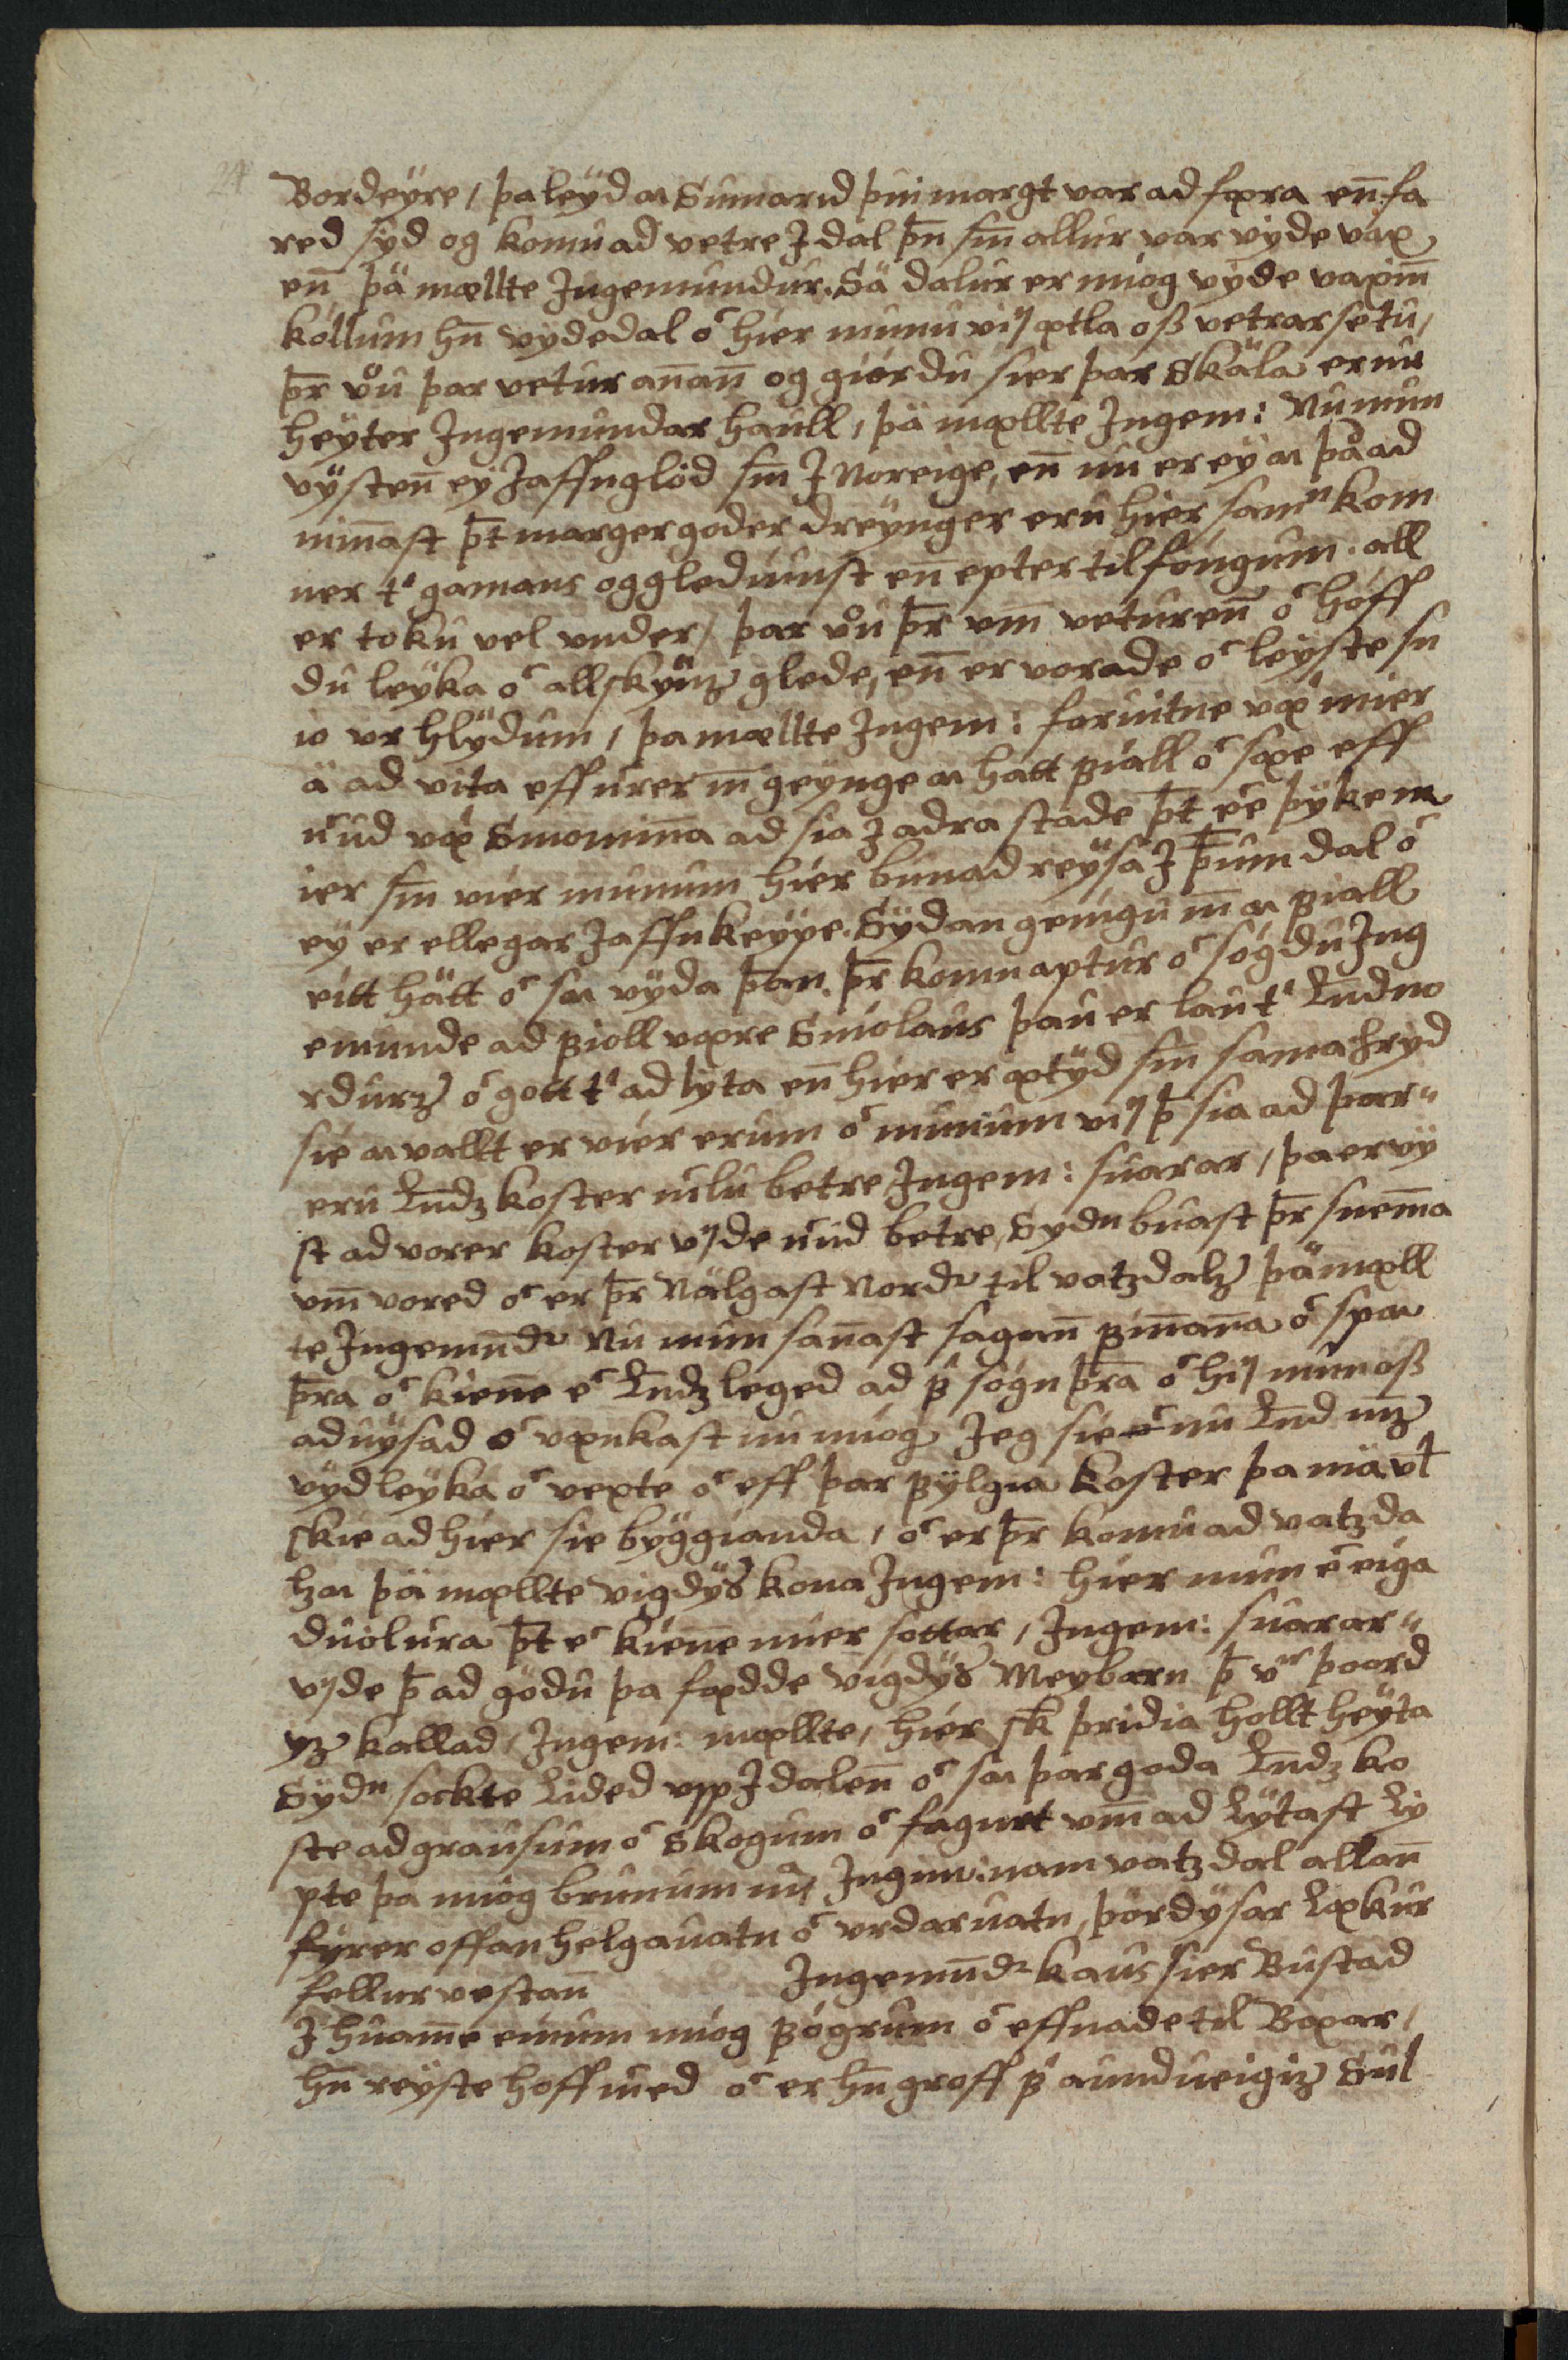 AM 138 fol - 12v